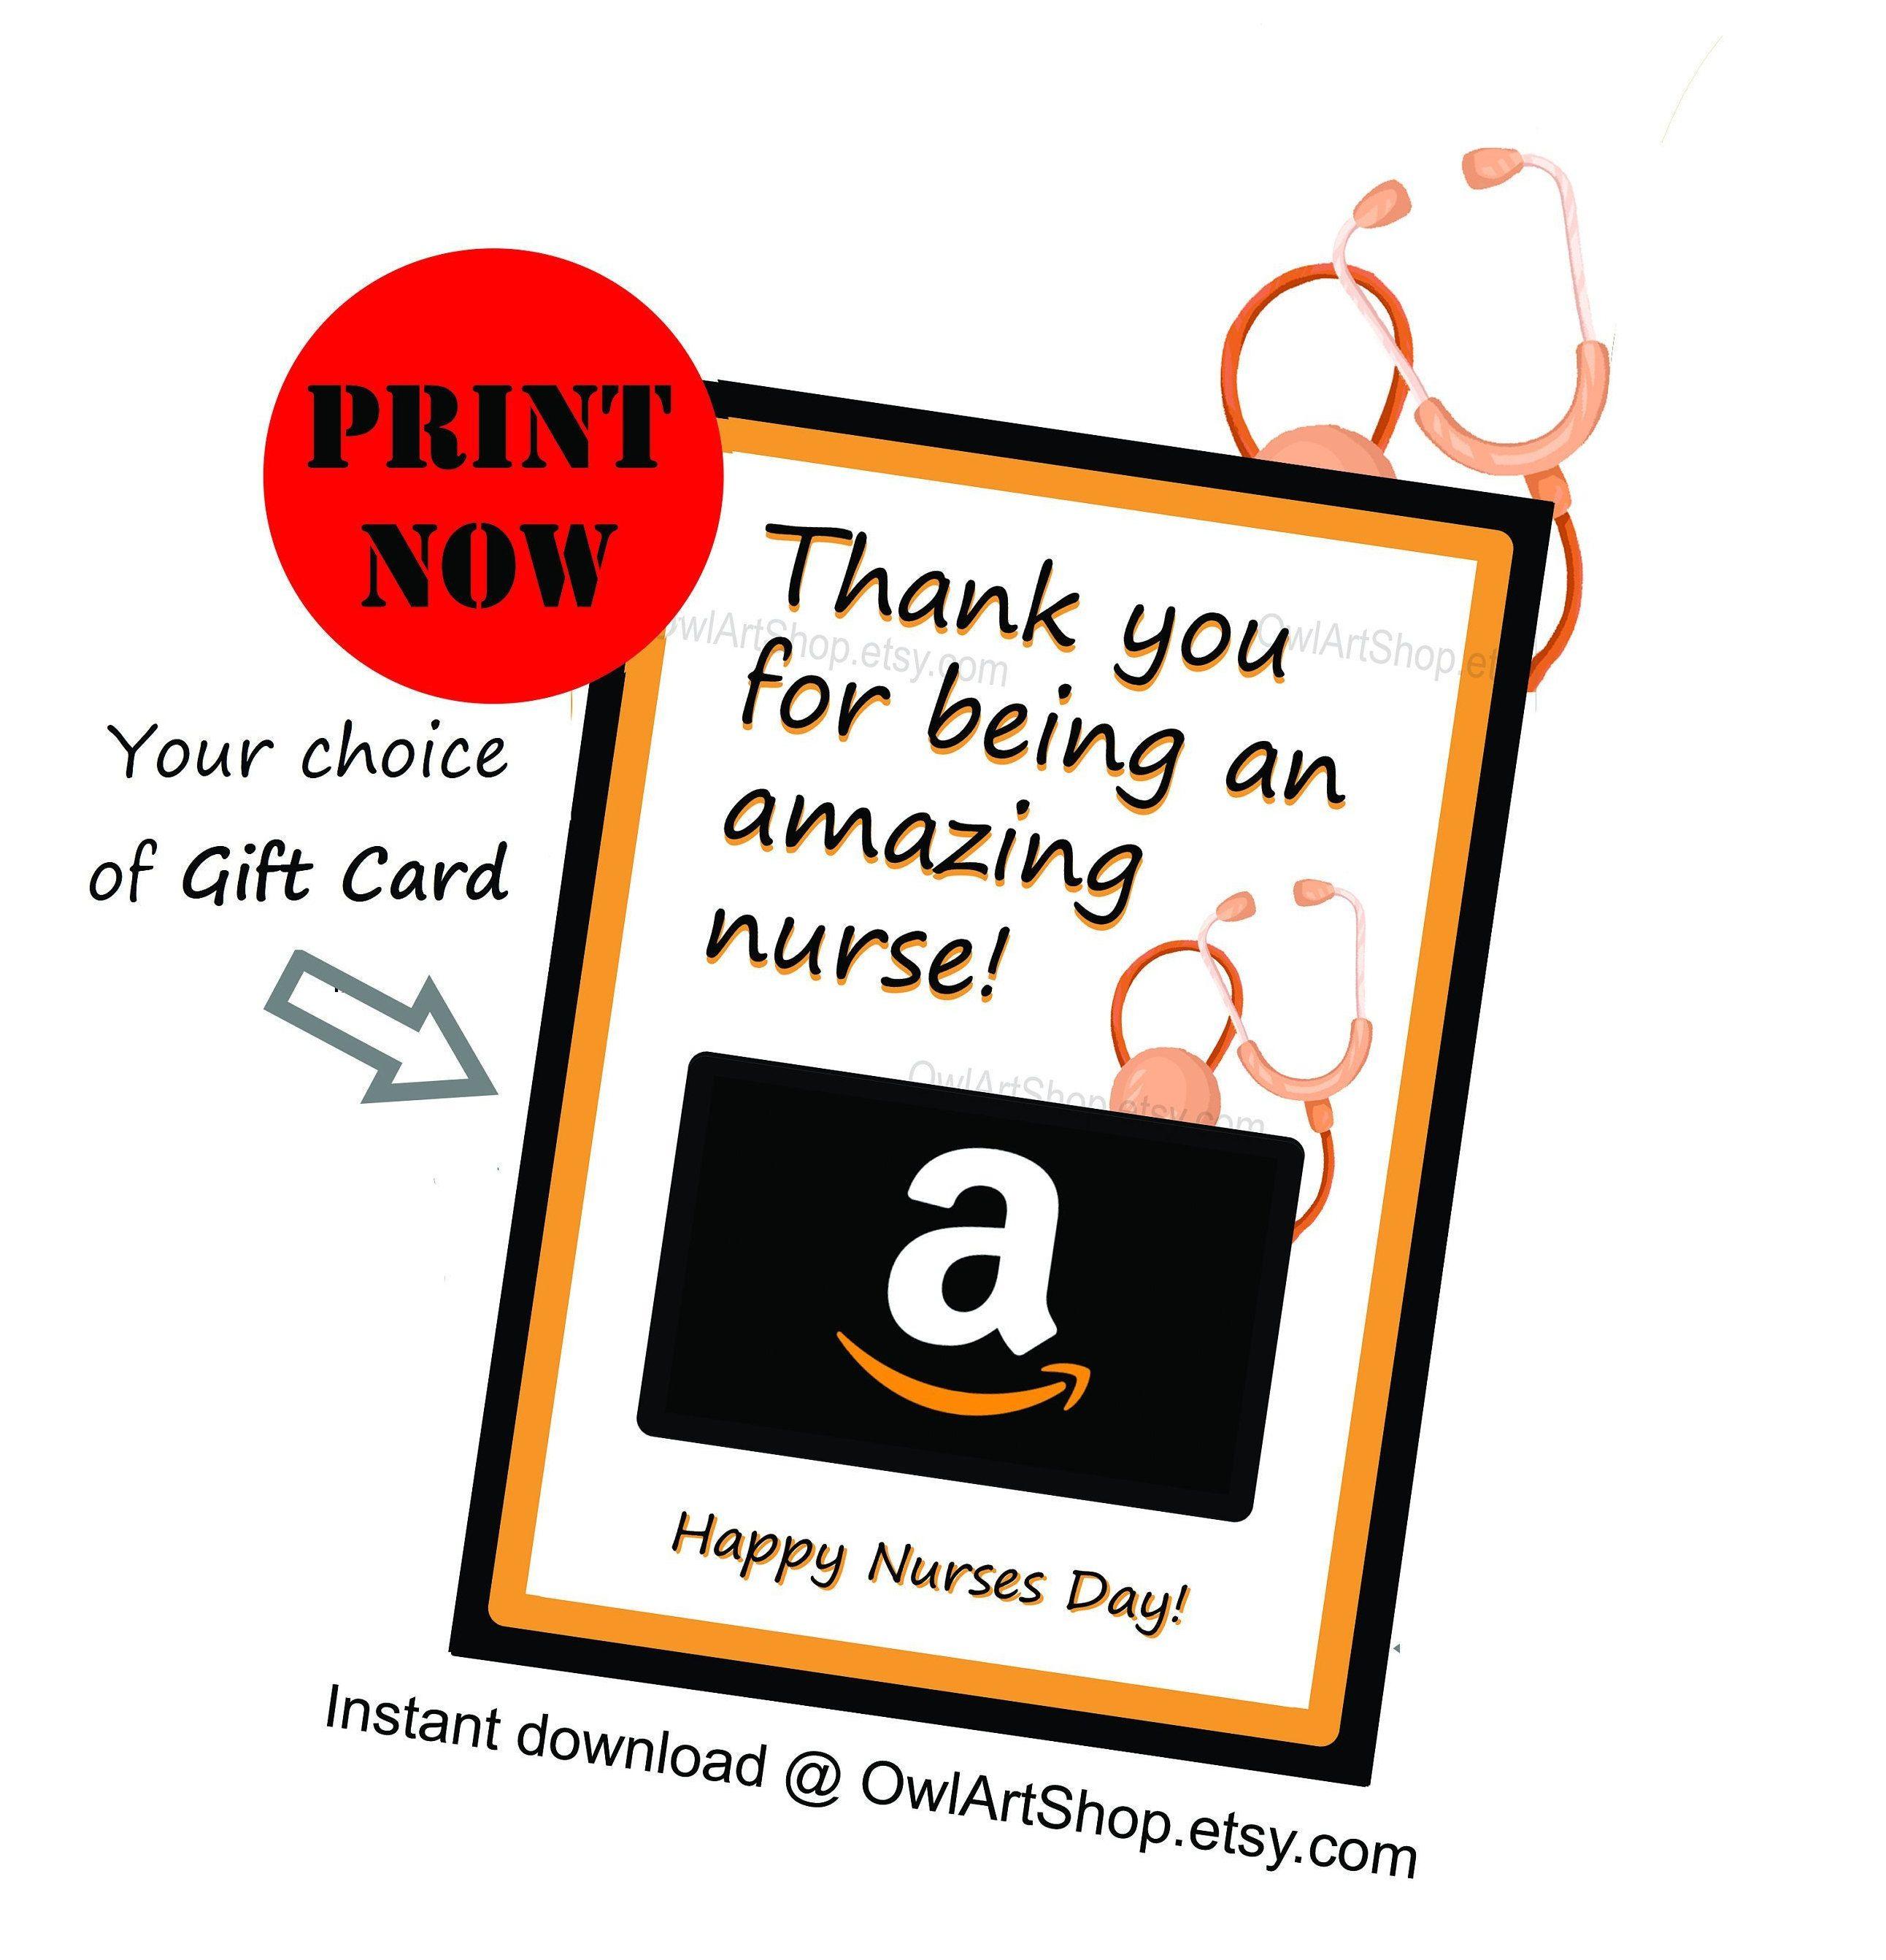 Nurses Day Gift Card Holder Nurses Appreciation Amazon Gift Card Holder Card For Nurse Diy Printable Instant D Gift Card Holder Gift Card Amazon Gift Cards